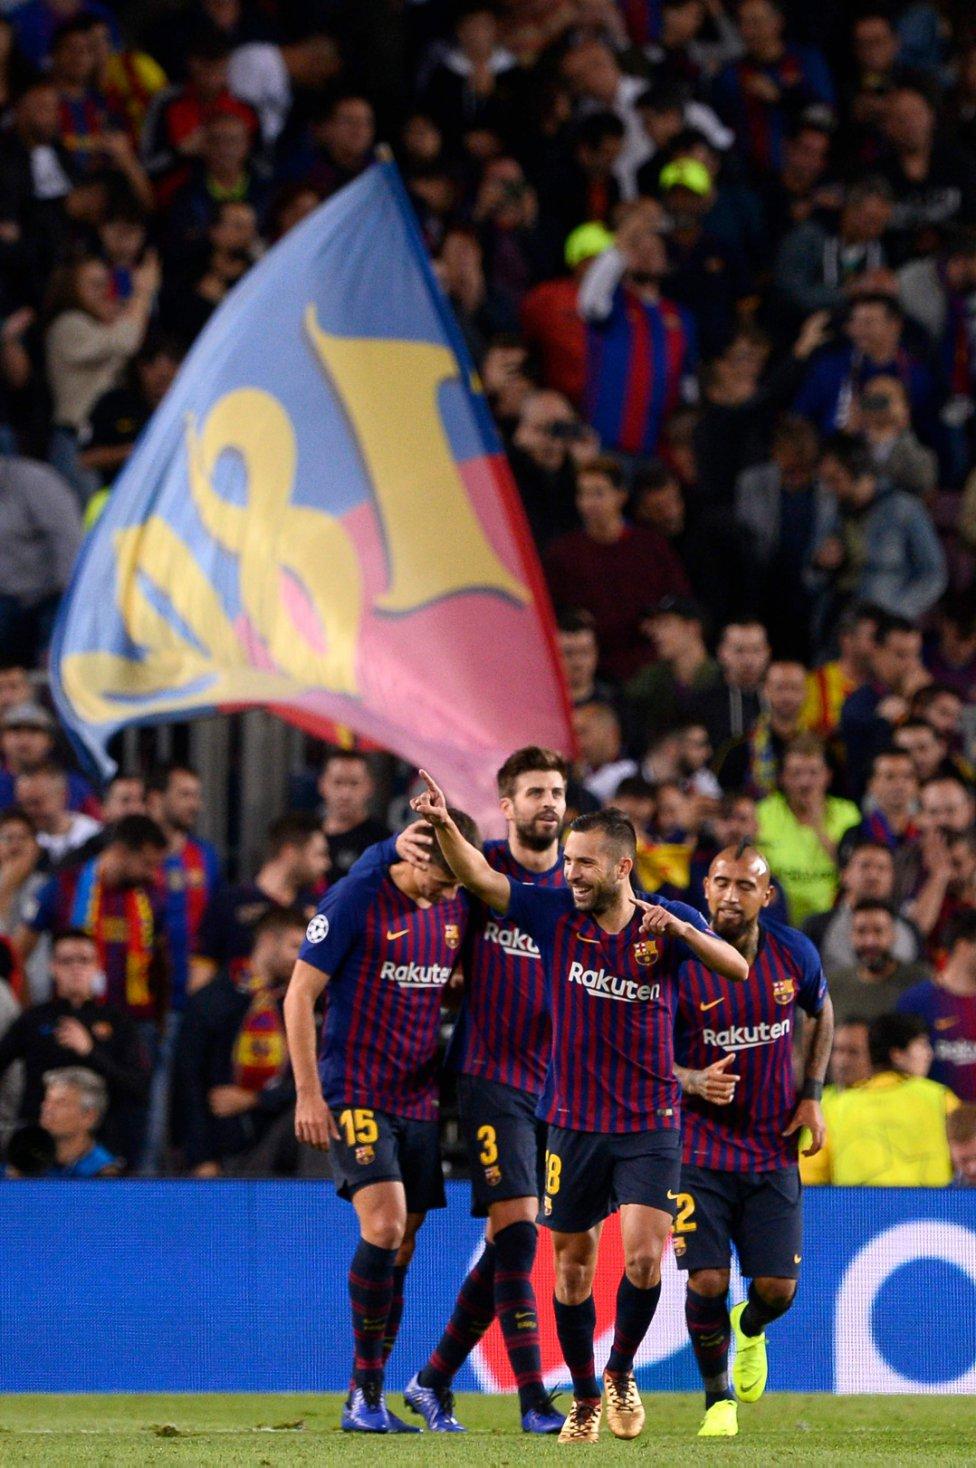 صور مباراة : برشلونة - إنتر ميلان 2-0 ( 24-10-2018 )  1540408387_114463_1540417380_album_grande